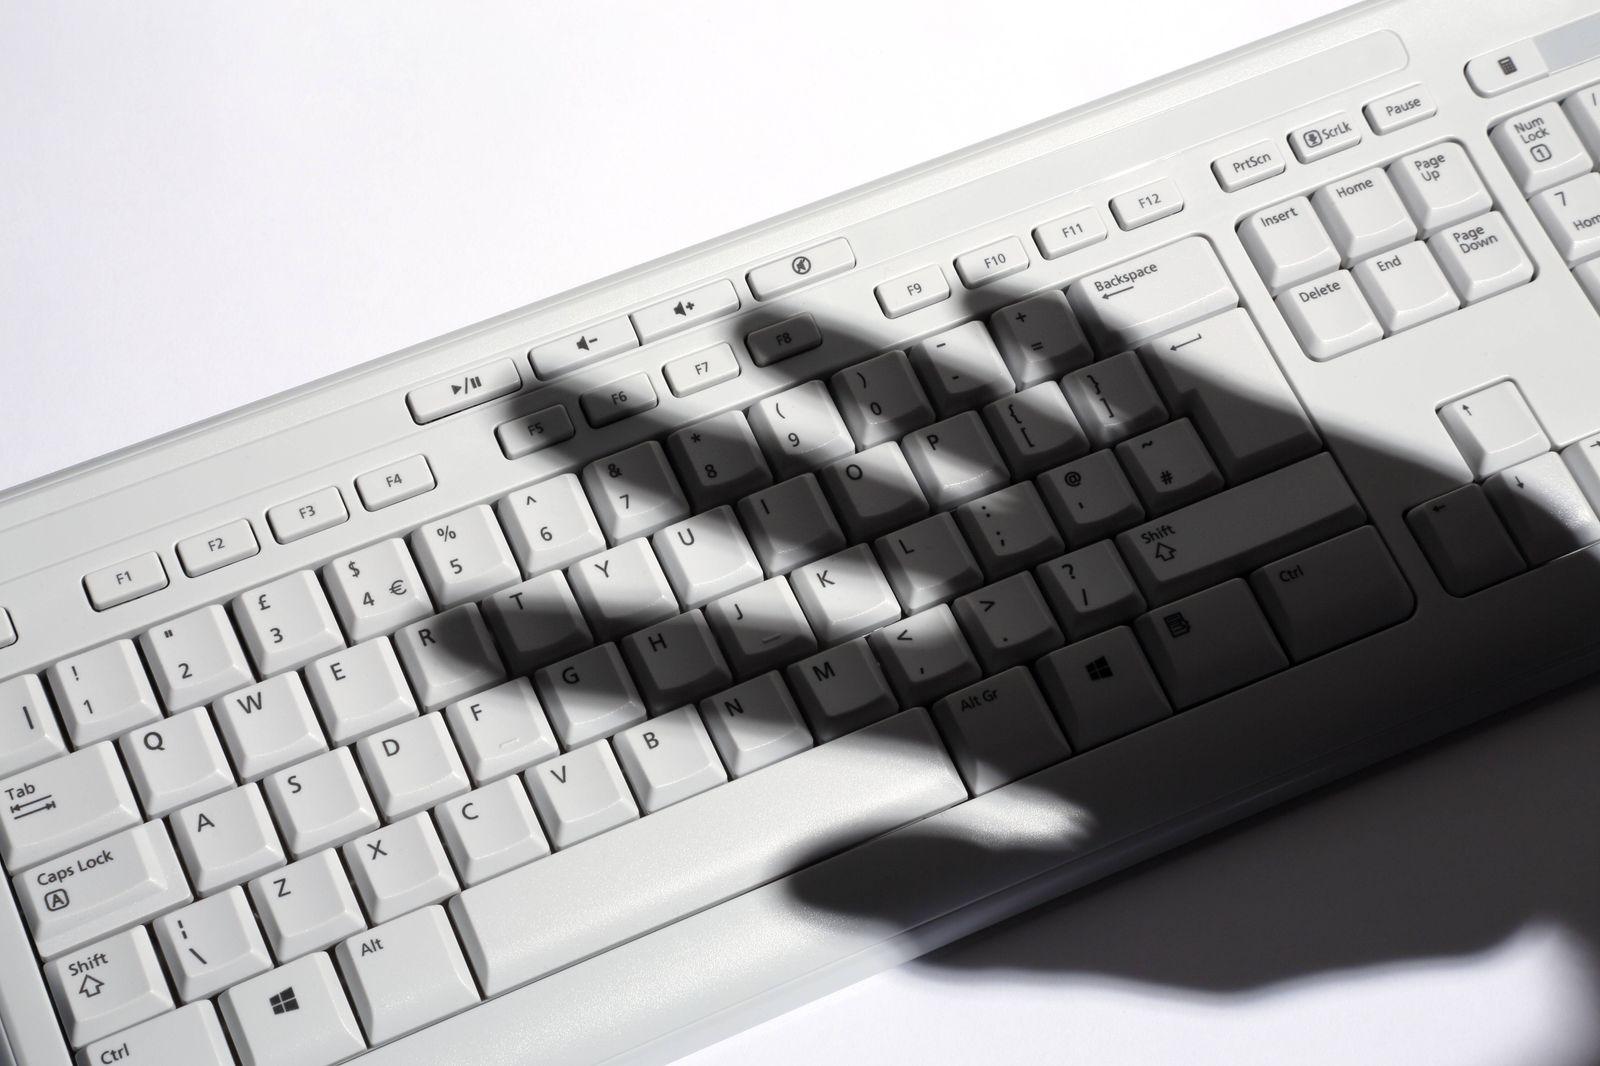 EINMALIGE VERWENDUNG Cybercrime